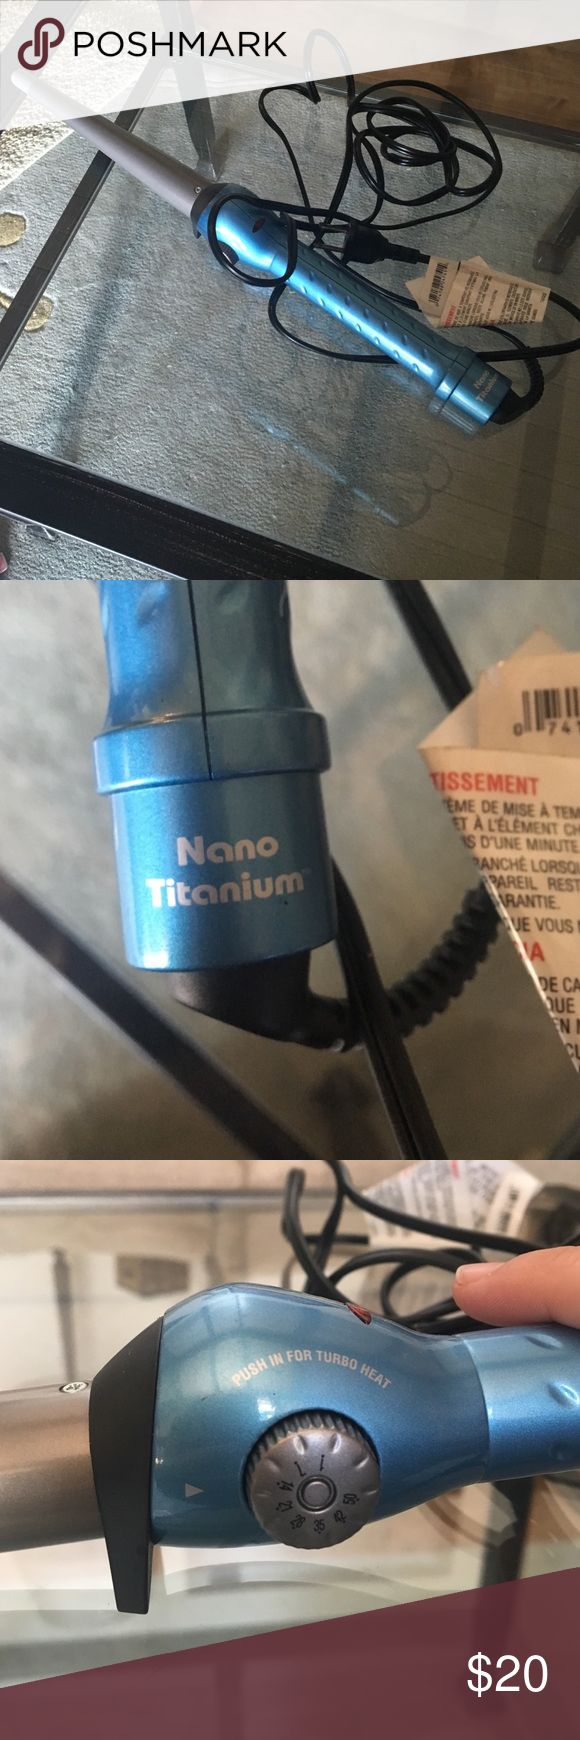 Wand curler - Nano Titanium BRAND NEW GREAT wand! Never used before! Multiple heat settings. Nano Titanium Other